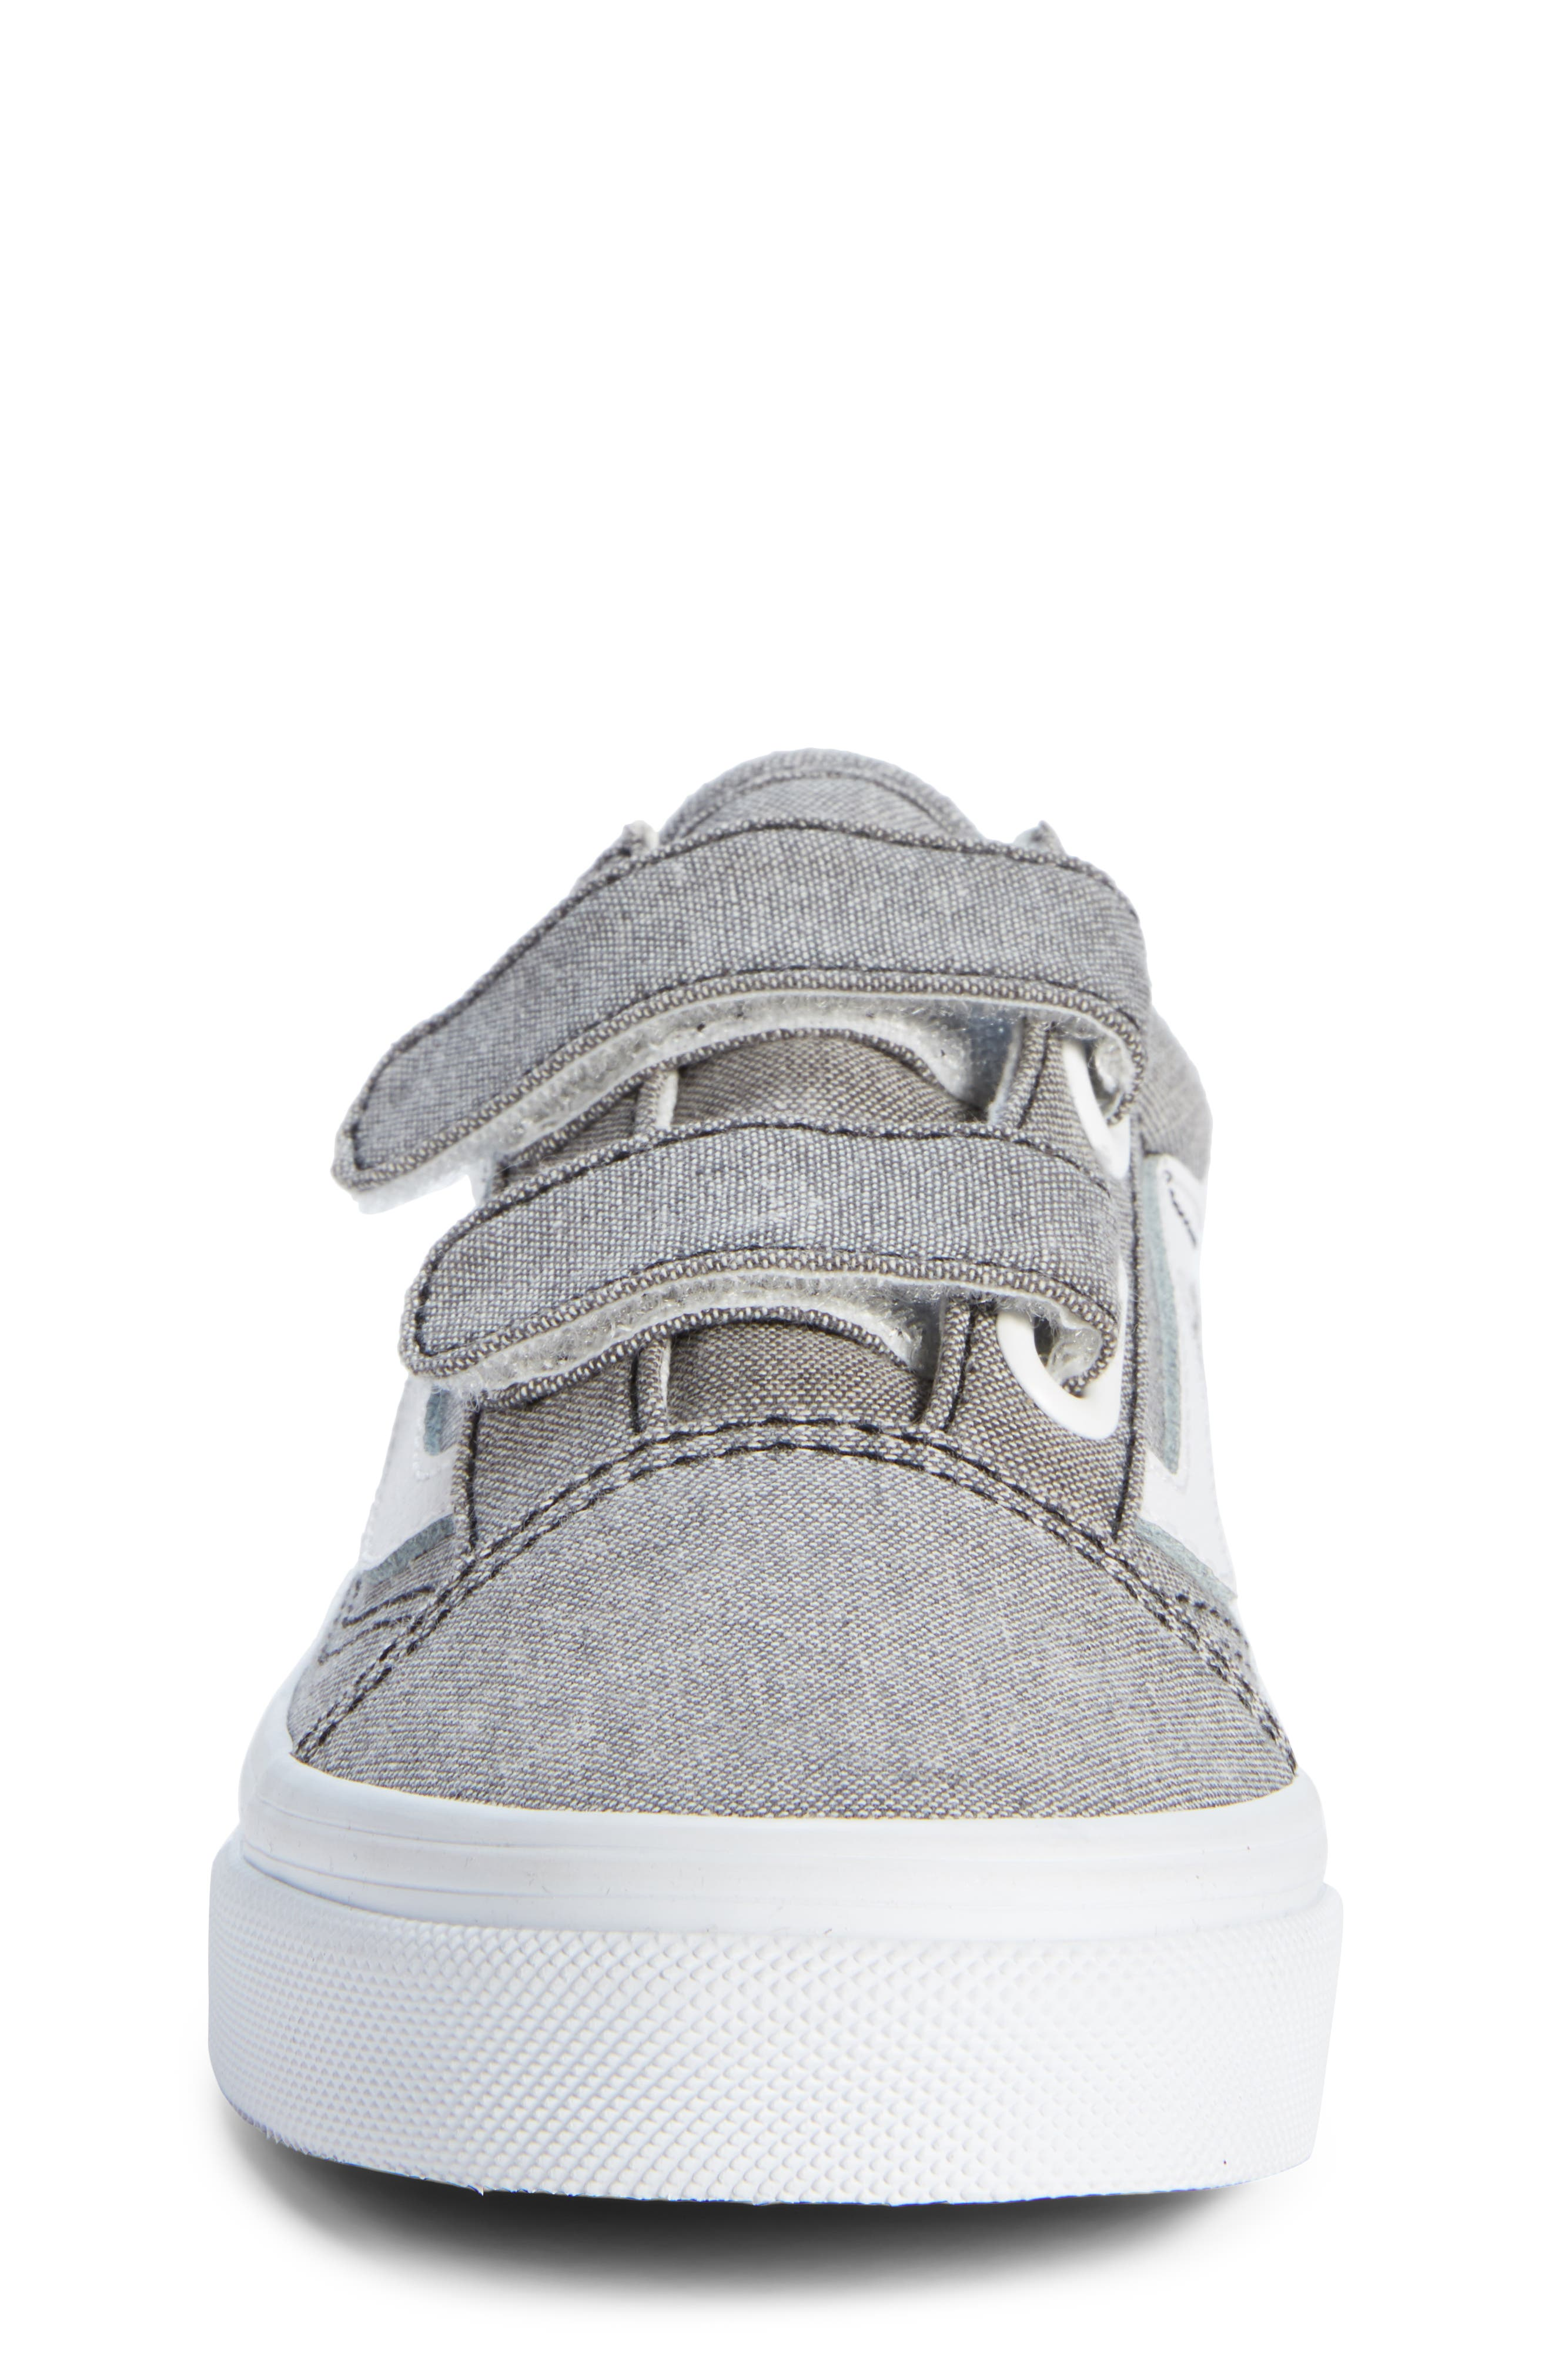 'Old Skool' Sneaker,                             Alternate thumbnail 4, color,                             Oxford Gray True White